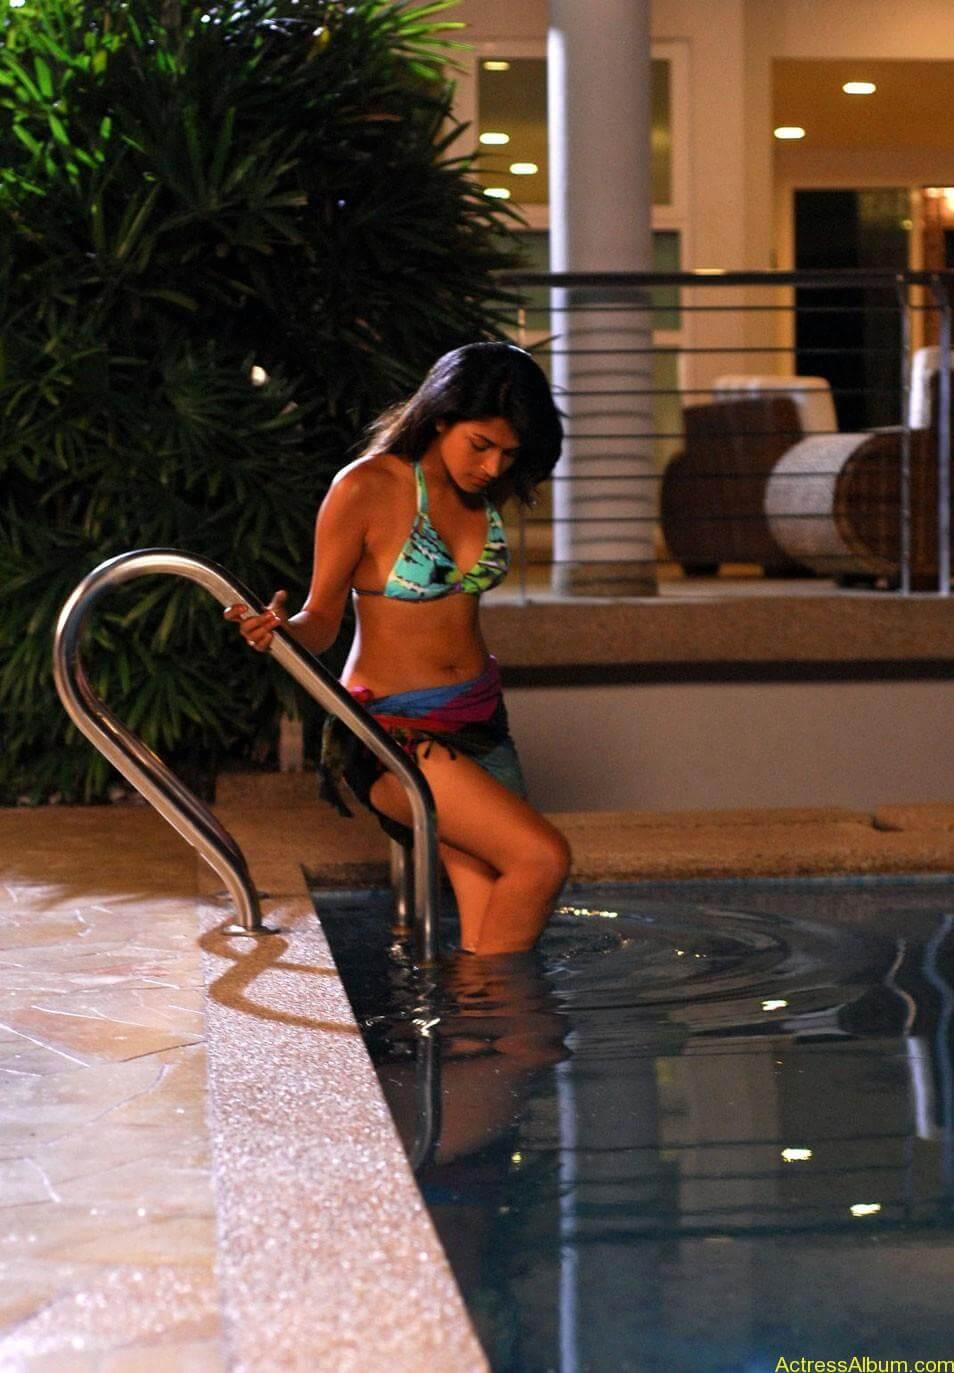 Shraddha-Das-Bikini-Photos-cf-03